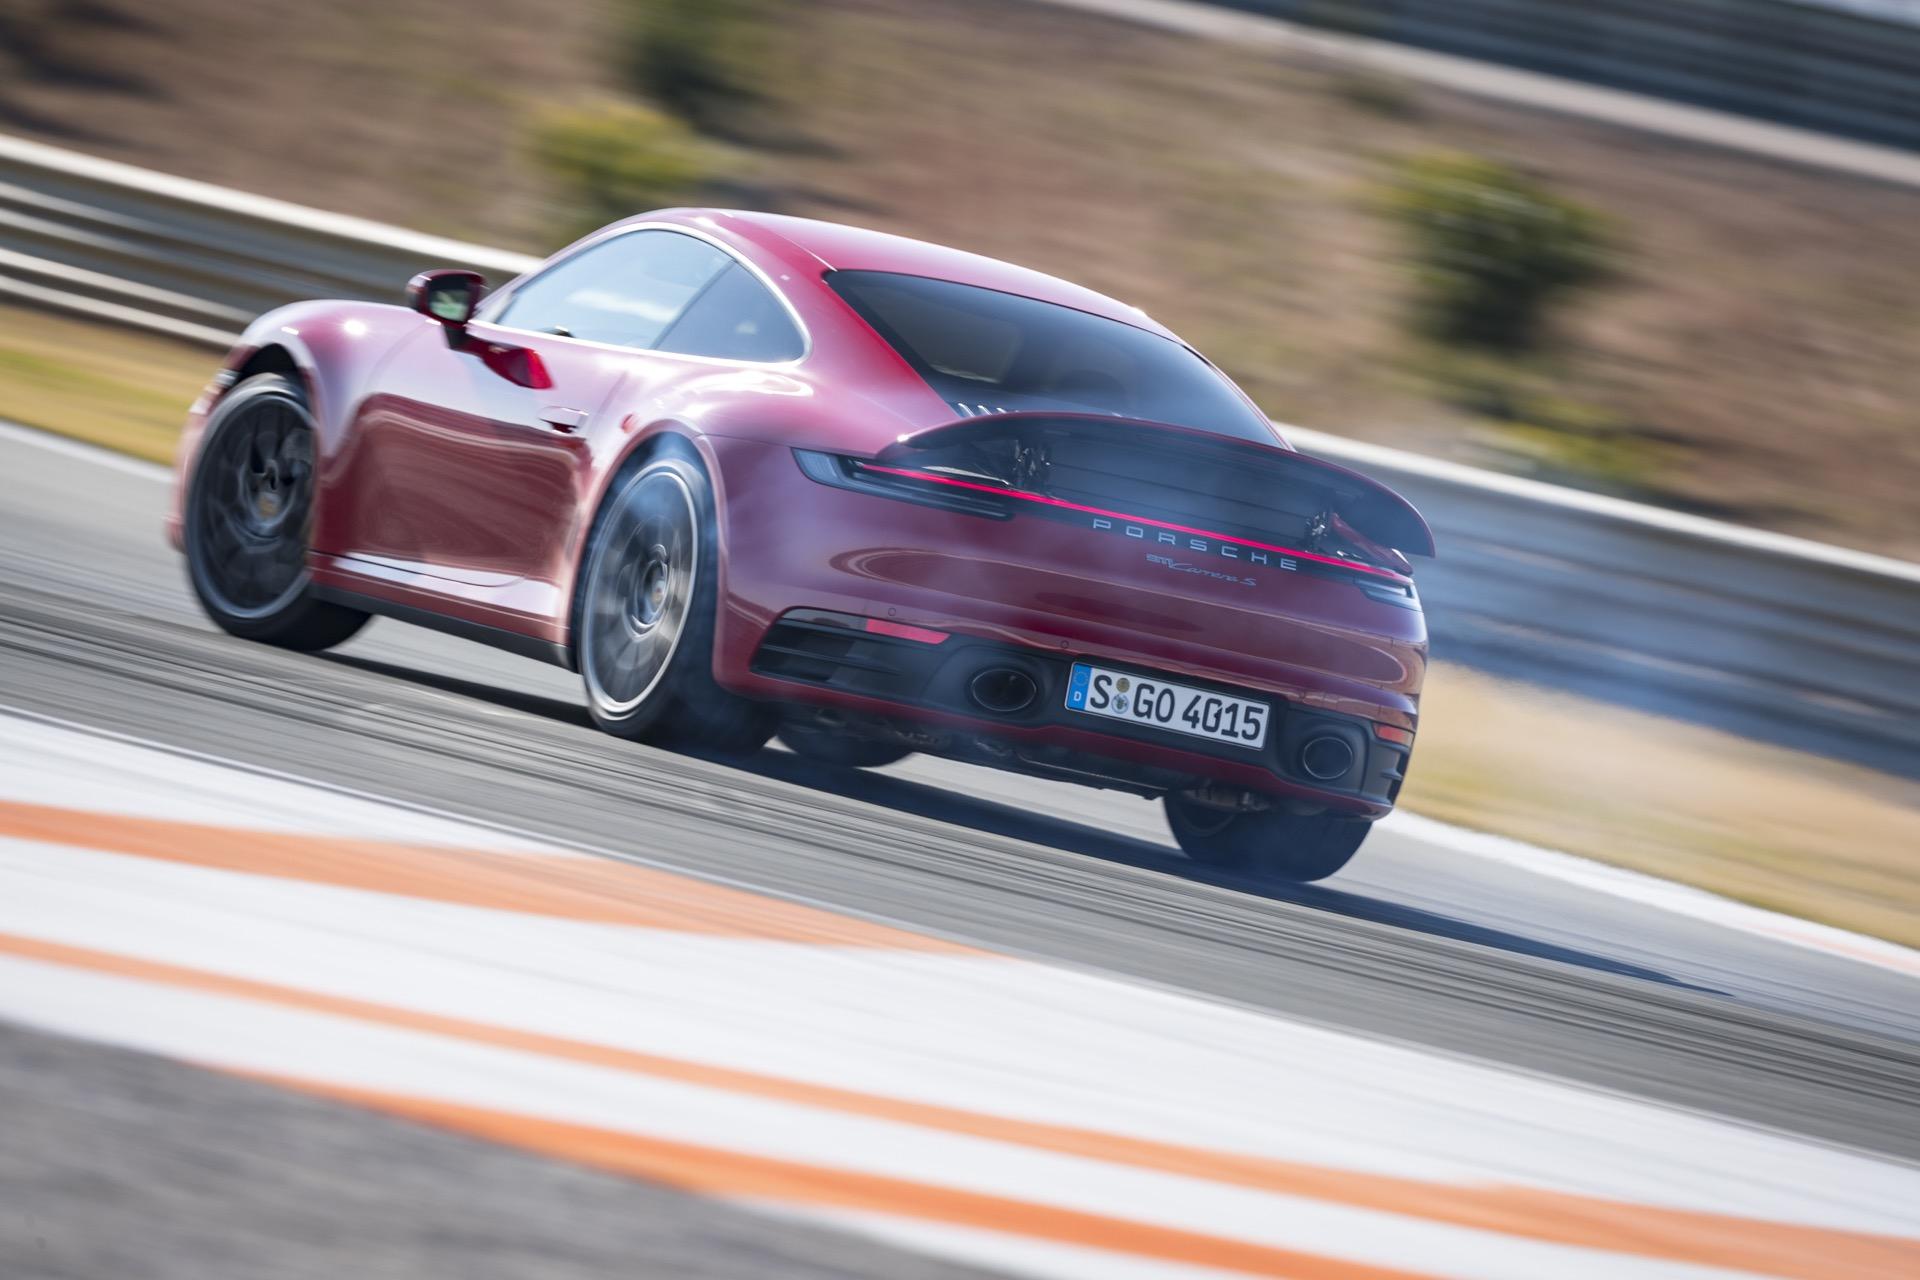 Porsche 911 992 Carrera S 00006